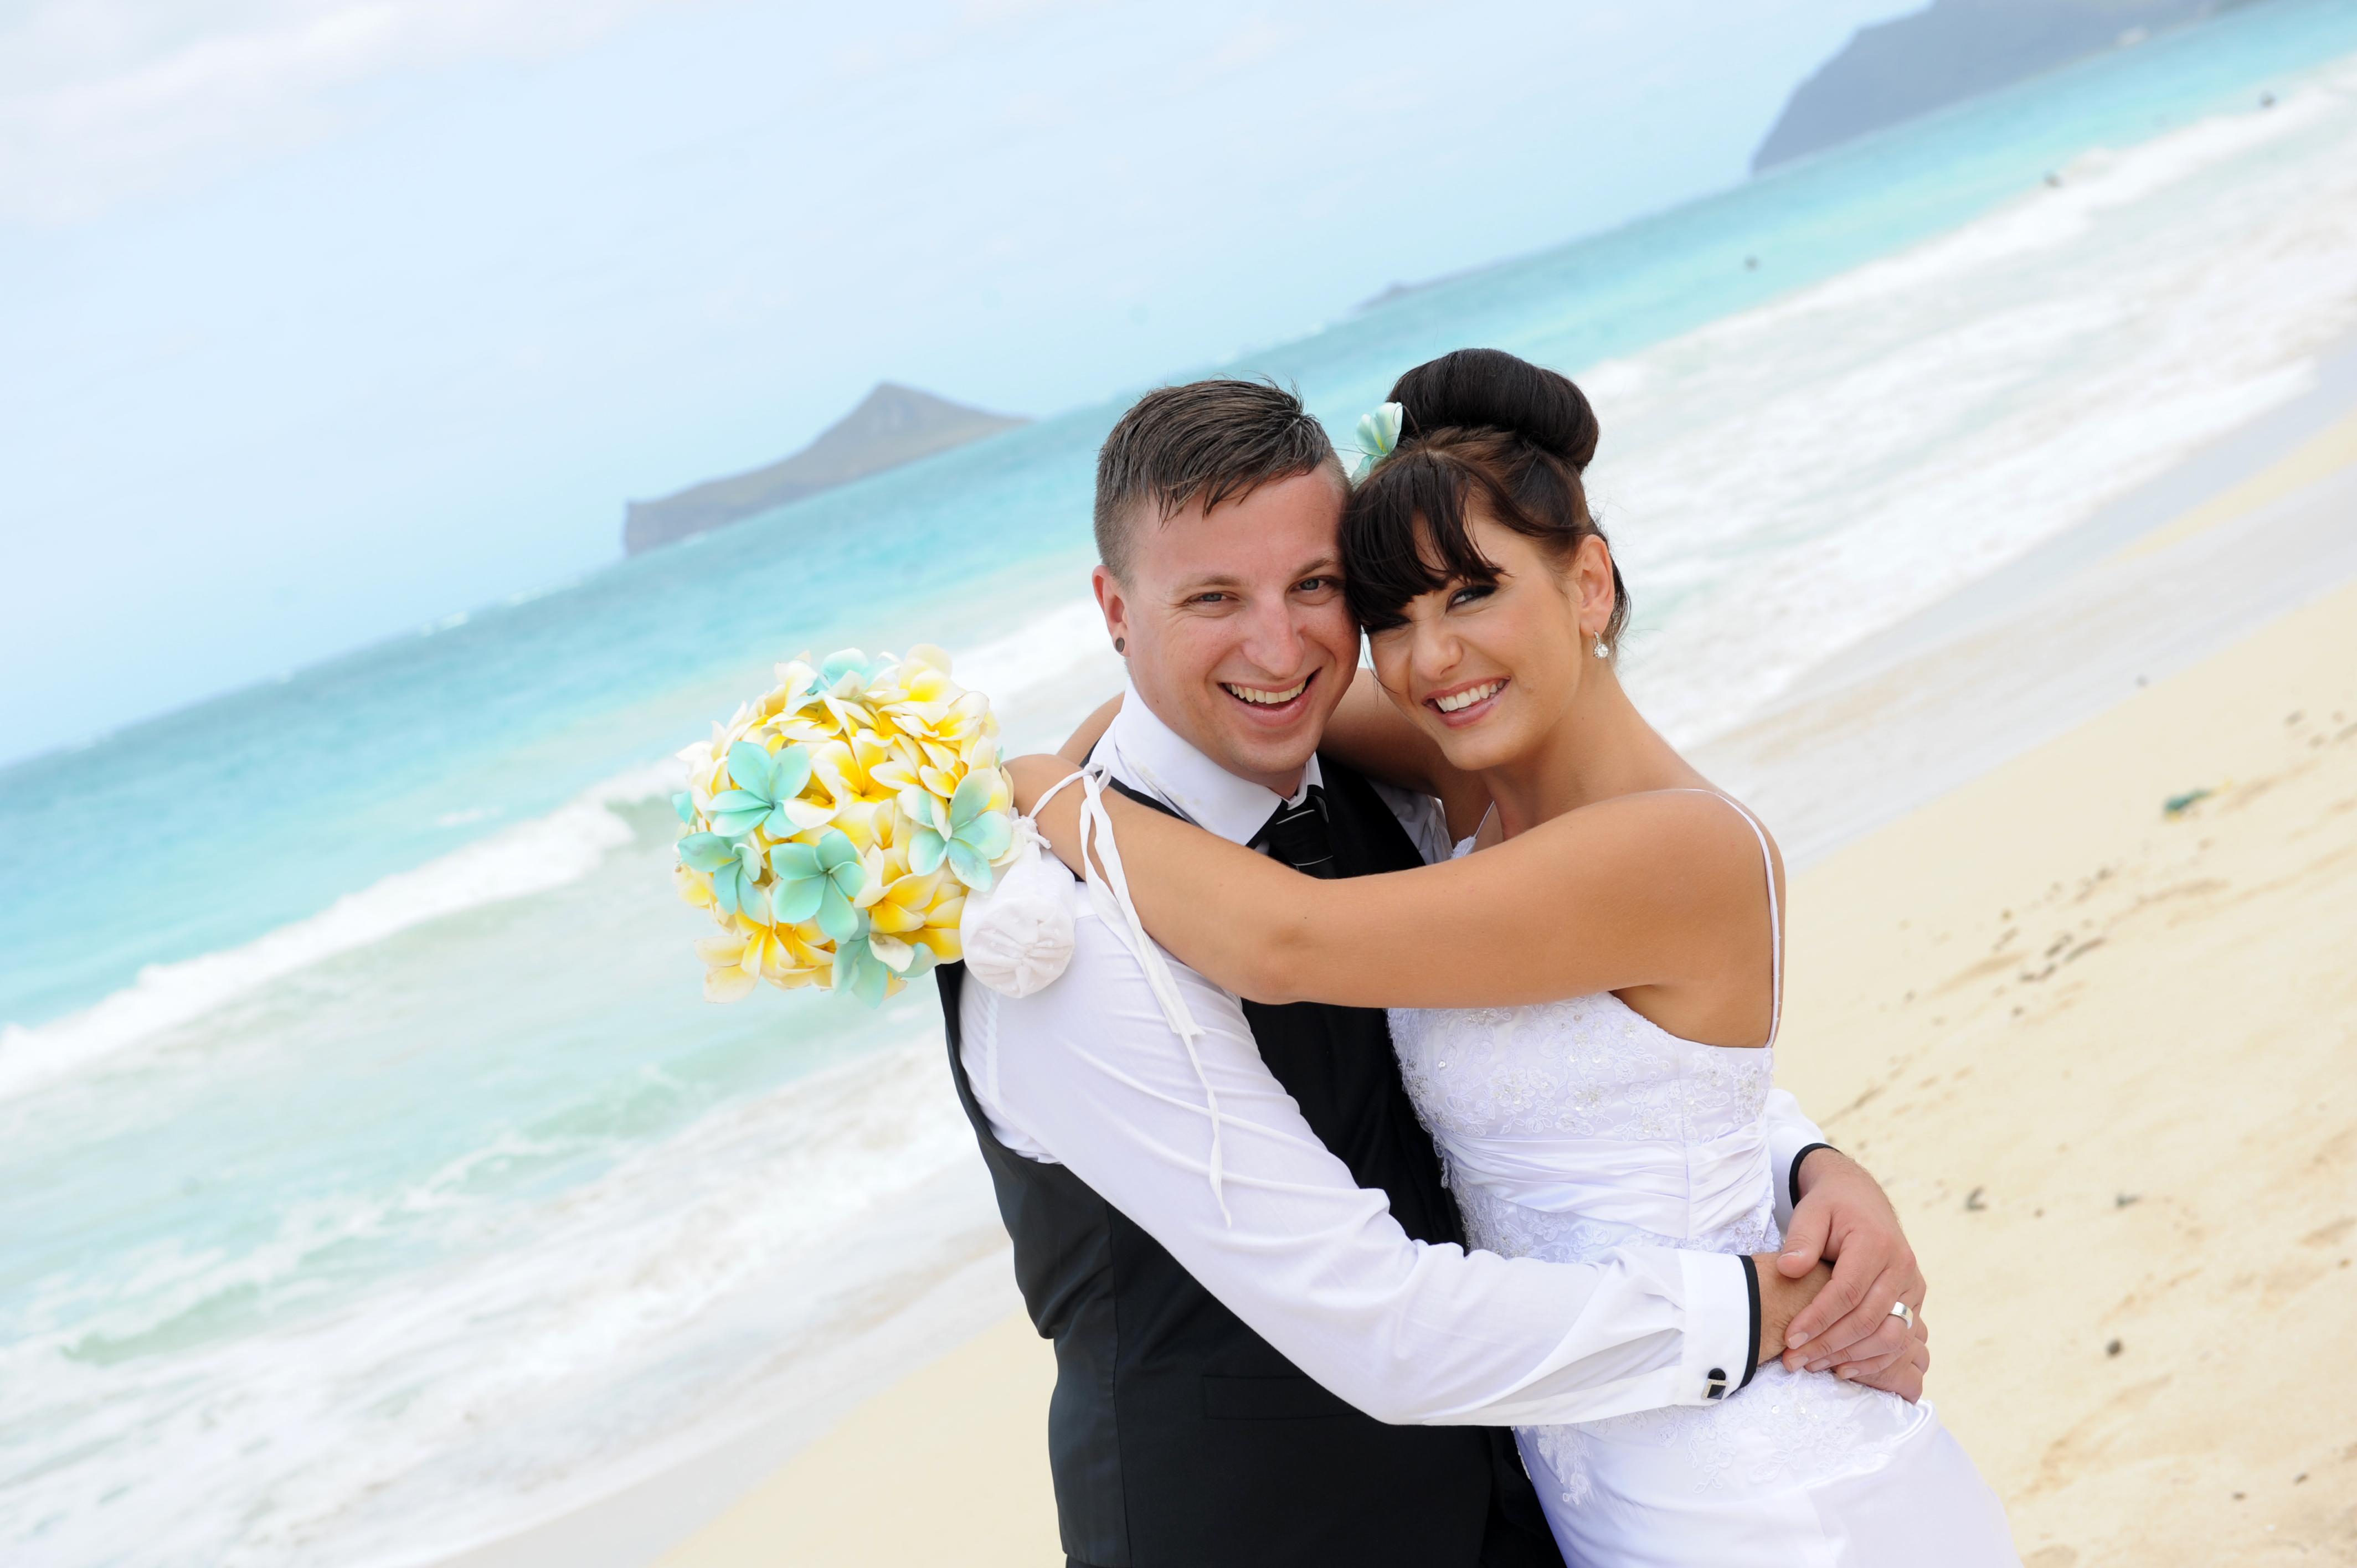 Alohaislandweddings.com- Wedding Picture in Hawaii-33